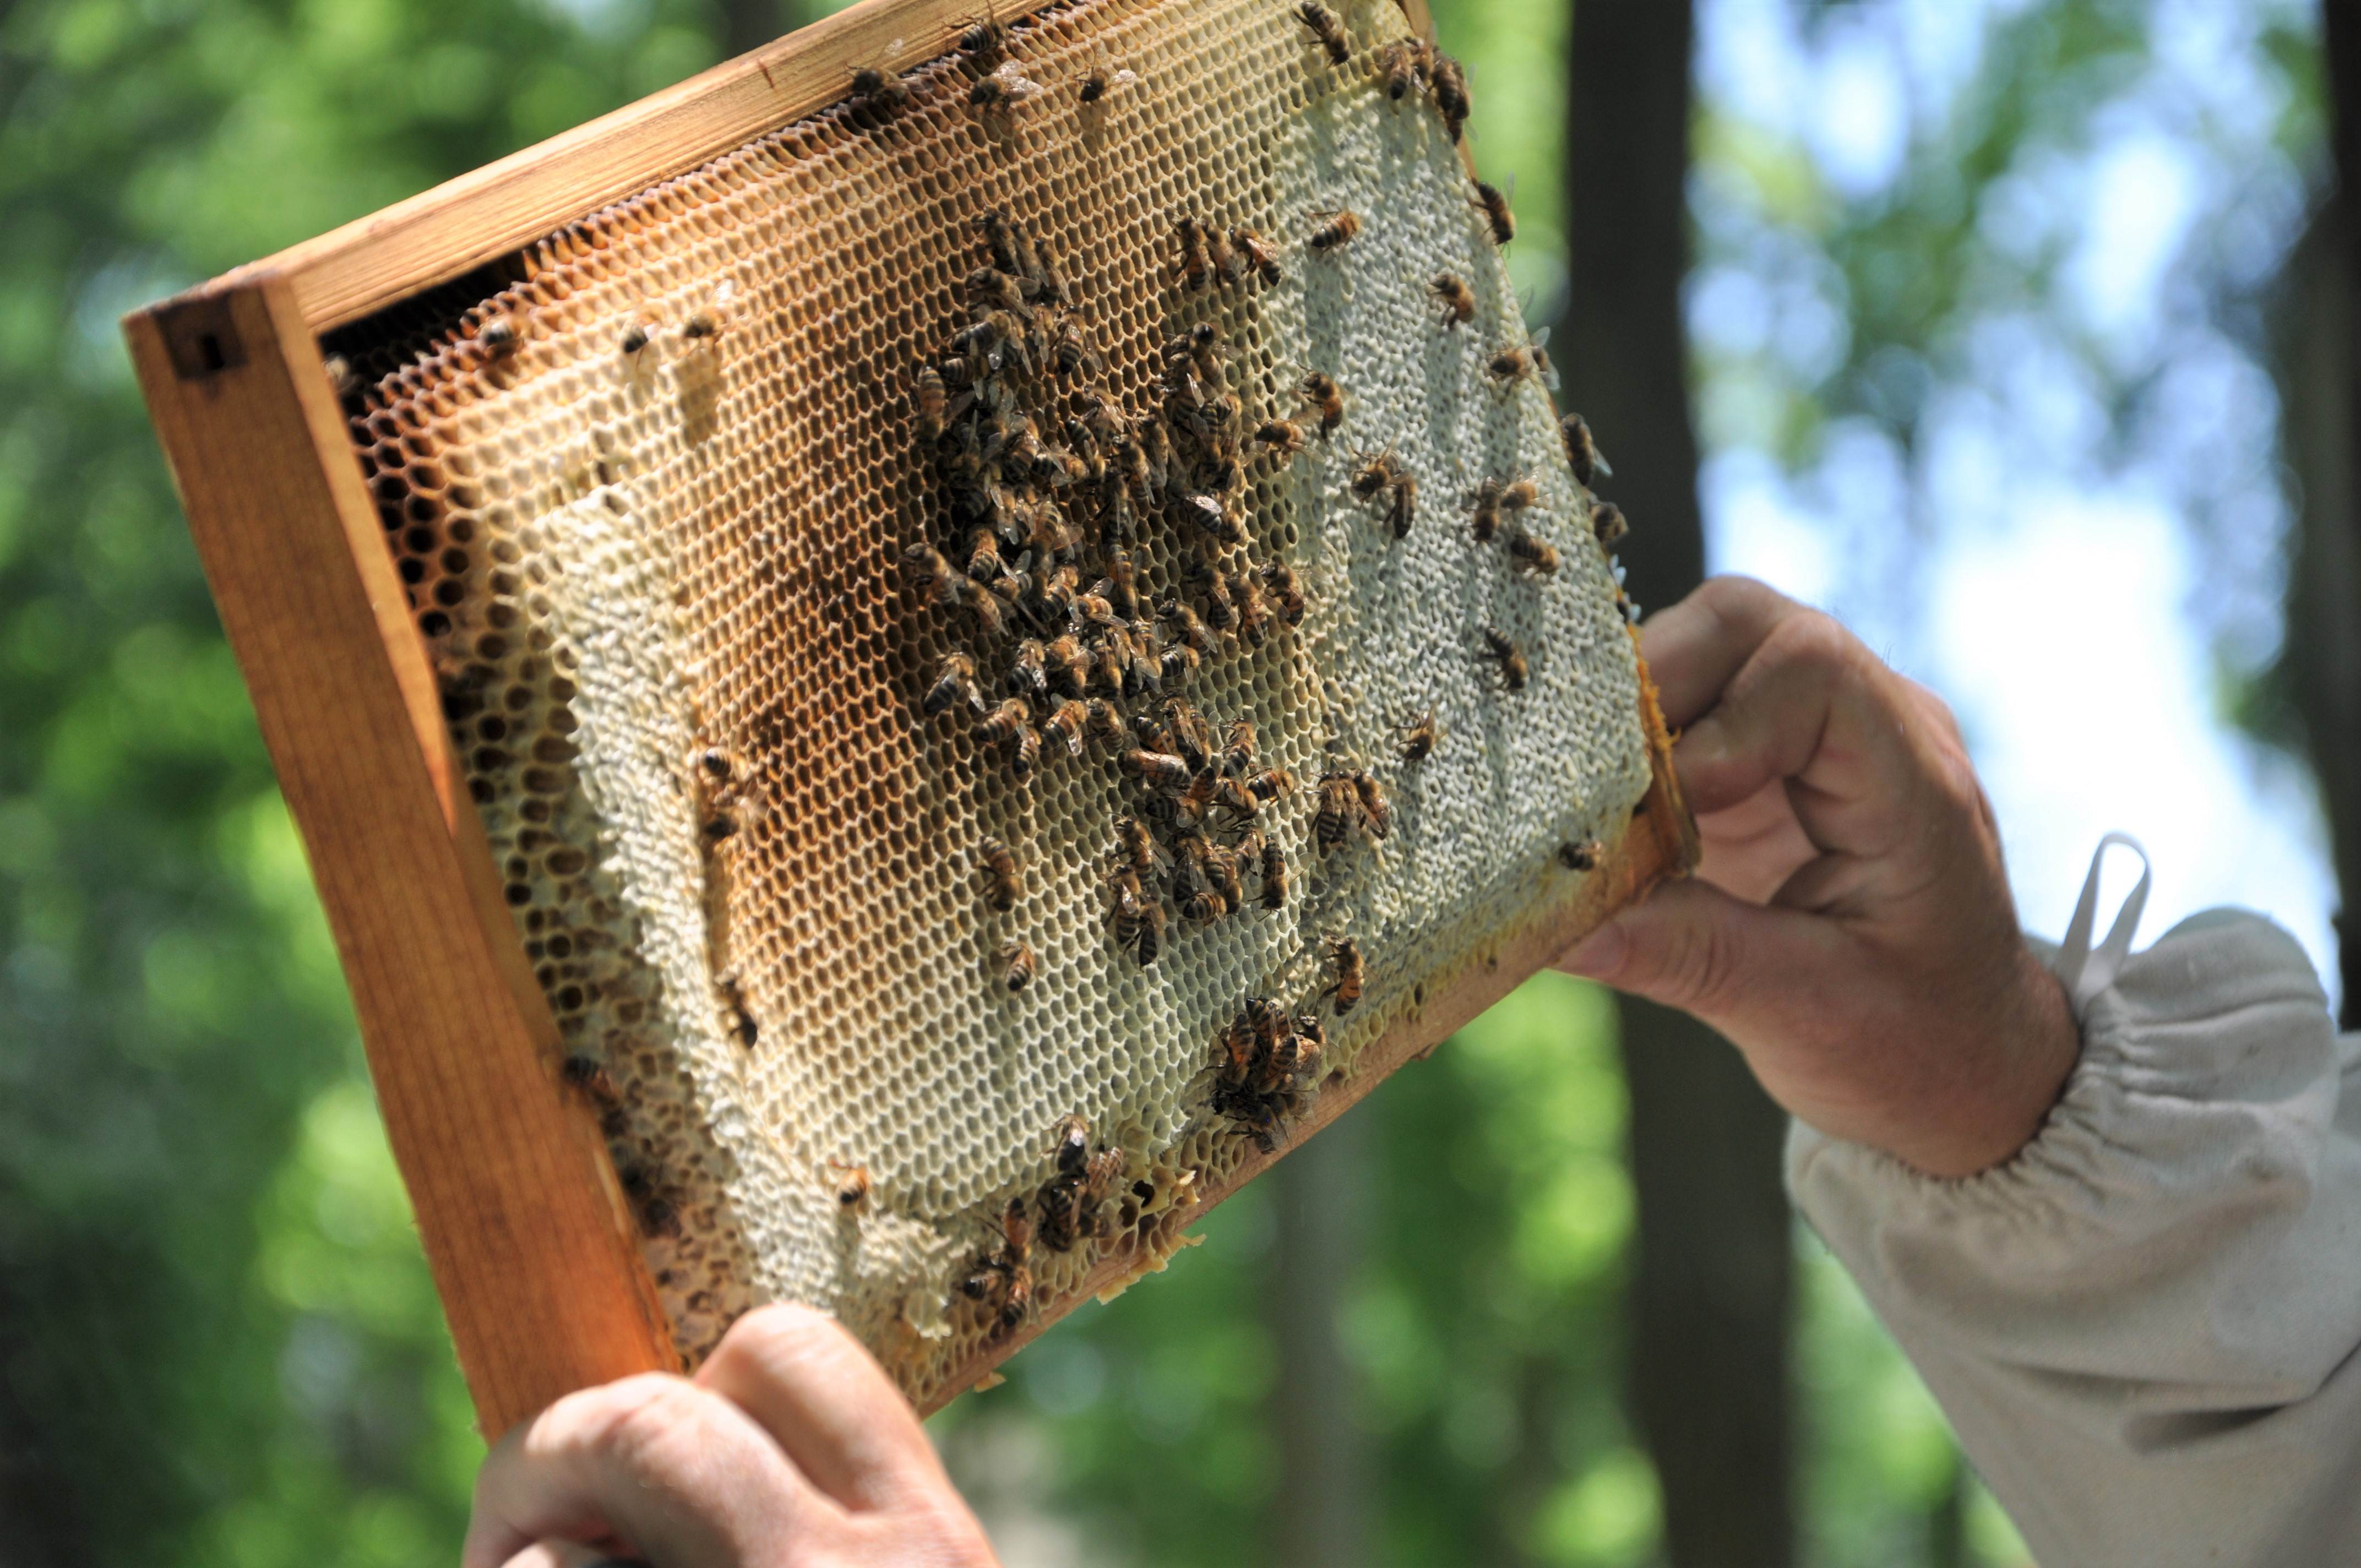 Celebrating Pollinator Week 2018